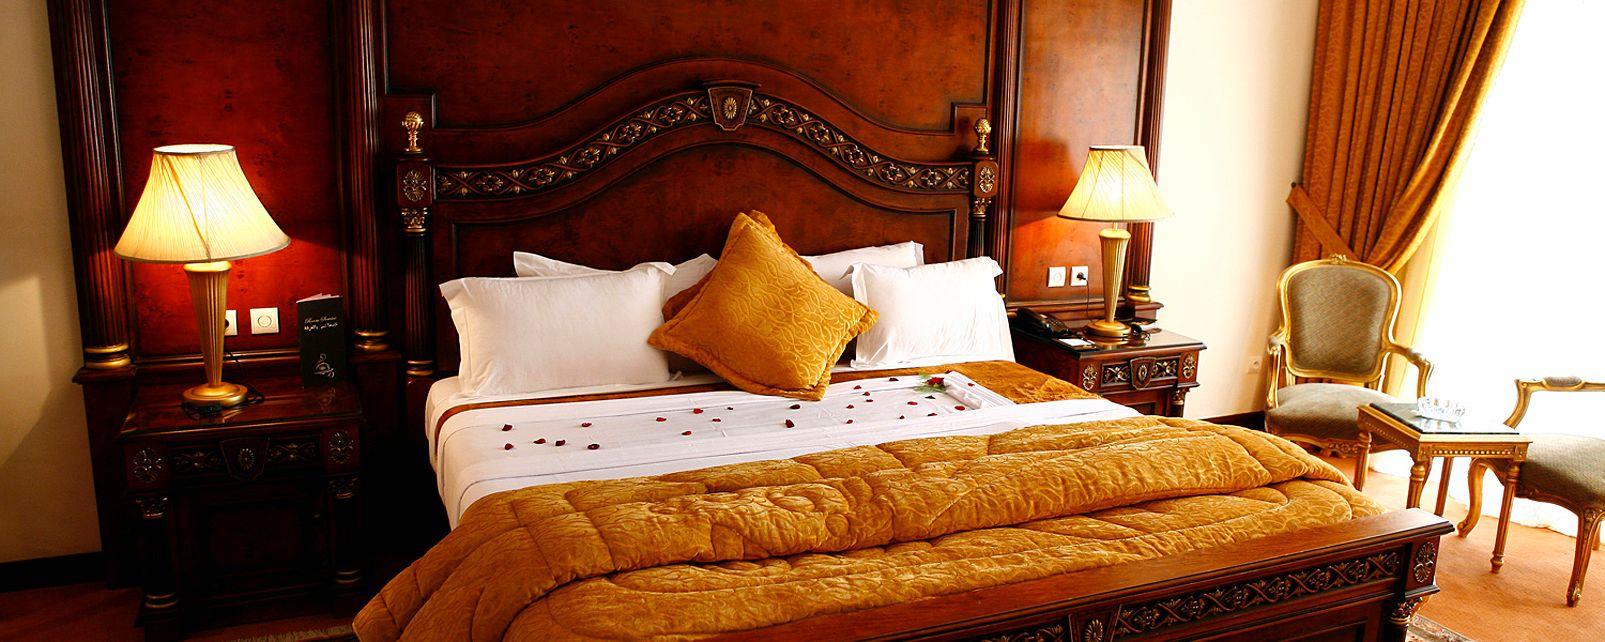 Hotel Ryad Mogador Agdal